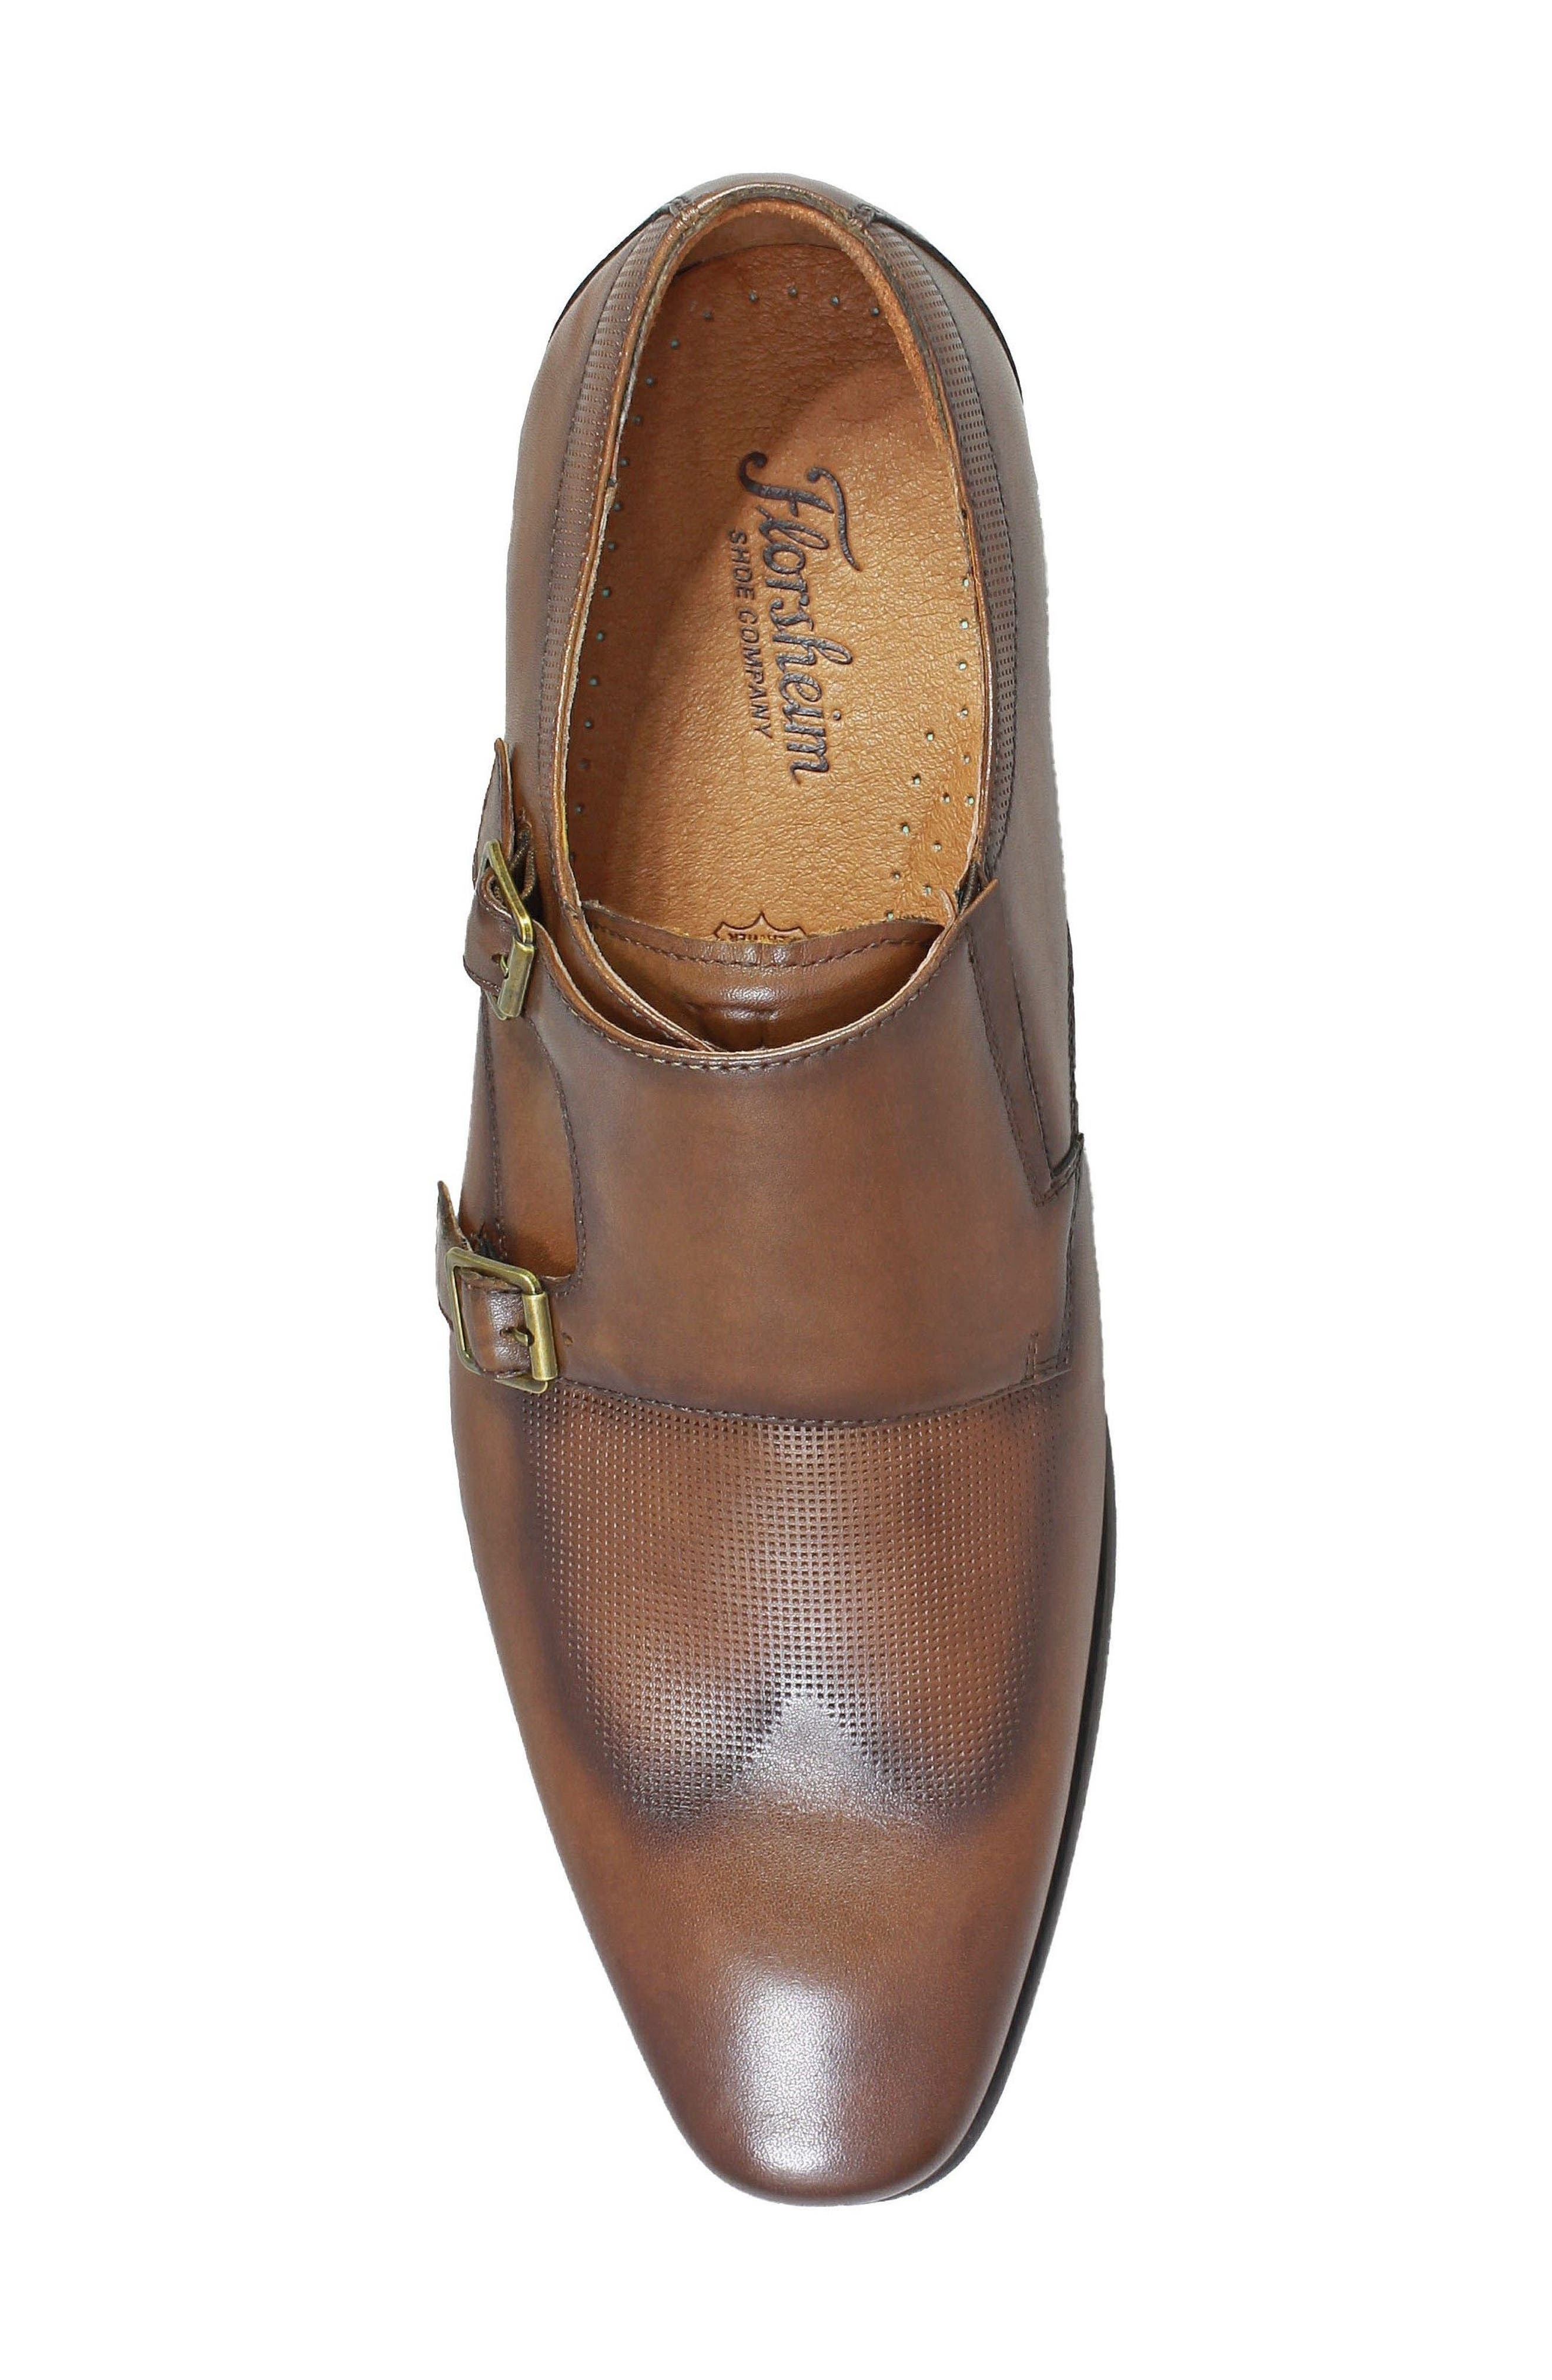 Postino Textured Double Strap Monk Shoe,                             Alternate thumbnail 5, color,                             Cognac Leather